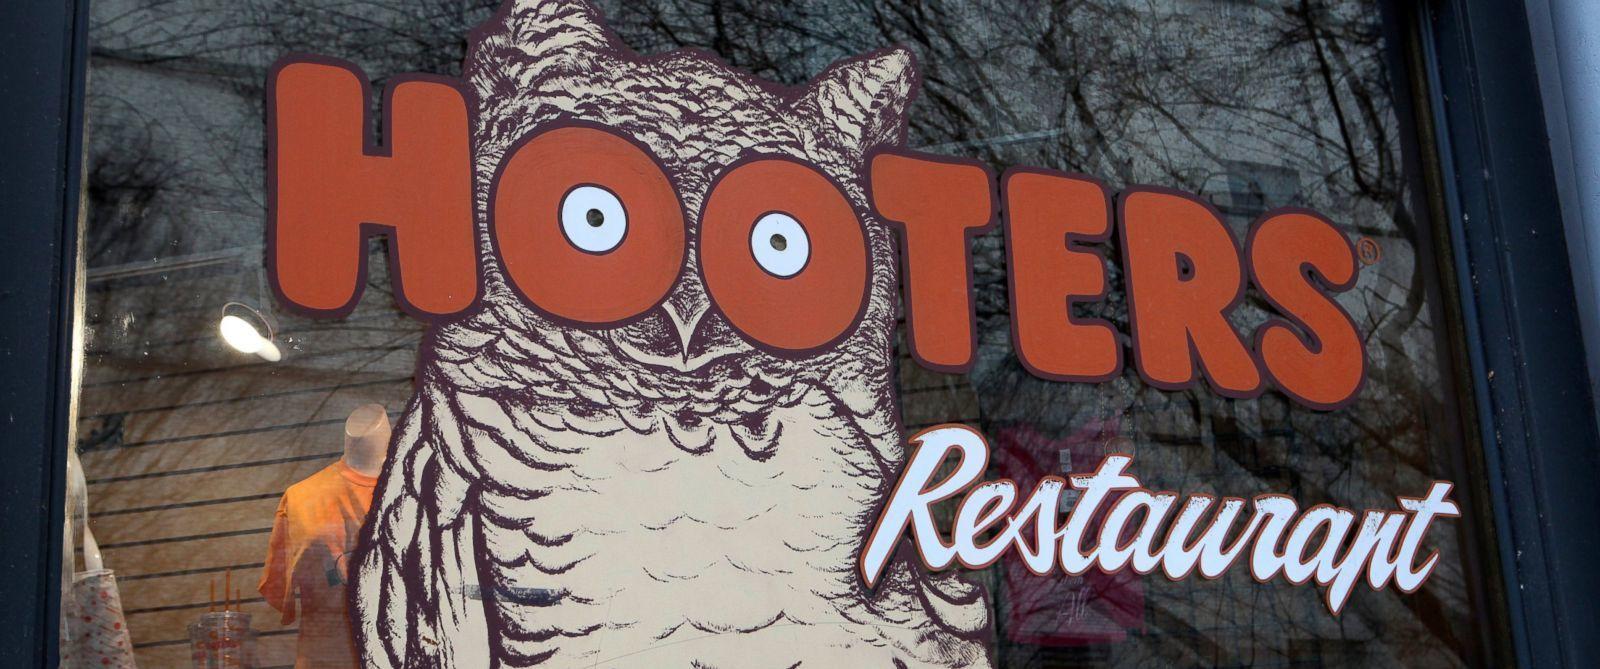 hooters-restaurant.jpg